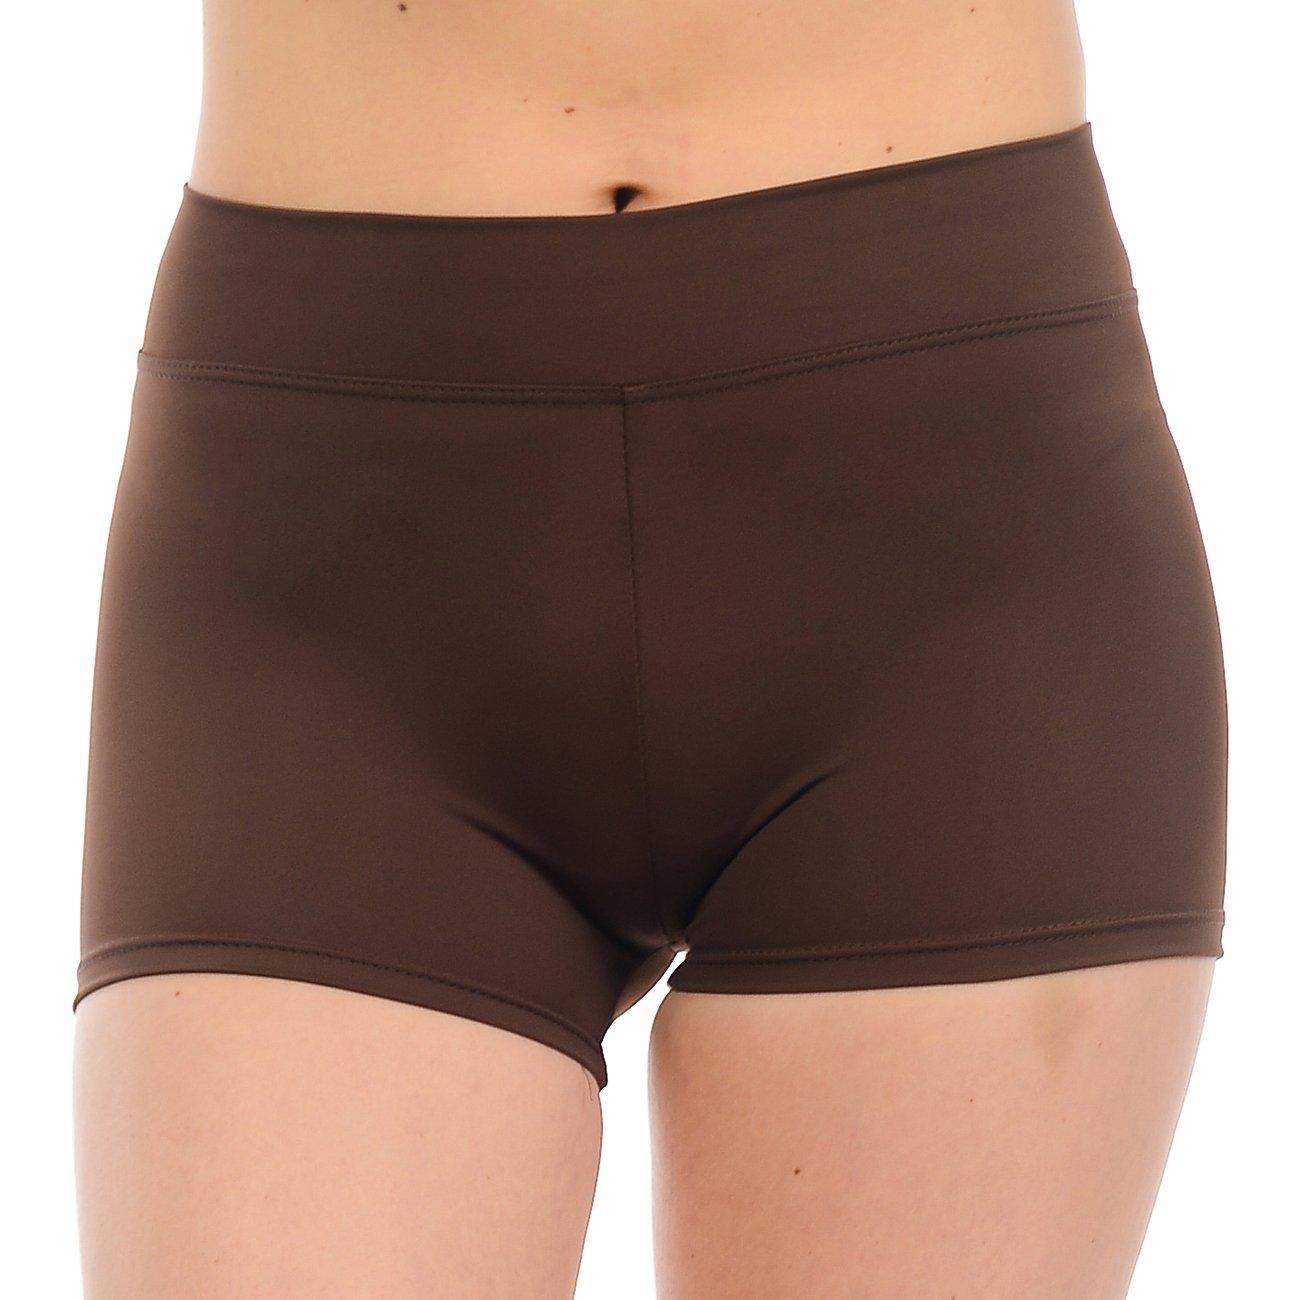 ANZA Girls Active Wear Dance Booty Shorts-Brown,Large